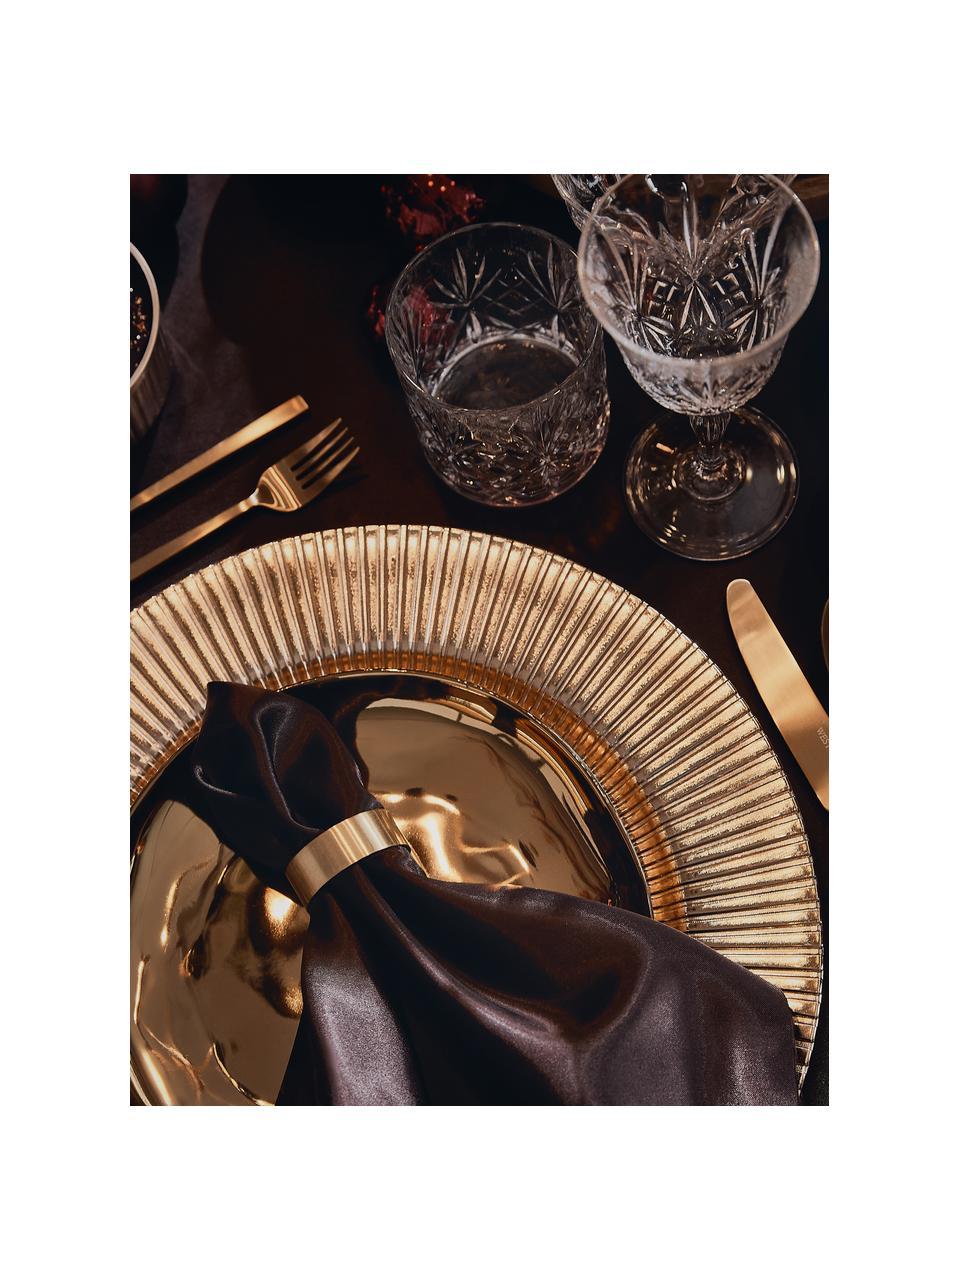 Set di posate dorate in acciaio inossidabile Shine, Coltello: acciaio inossidabile 13/0, Dorato, 1 persona (5 pz)